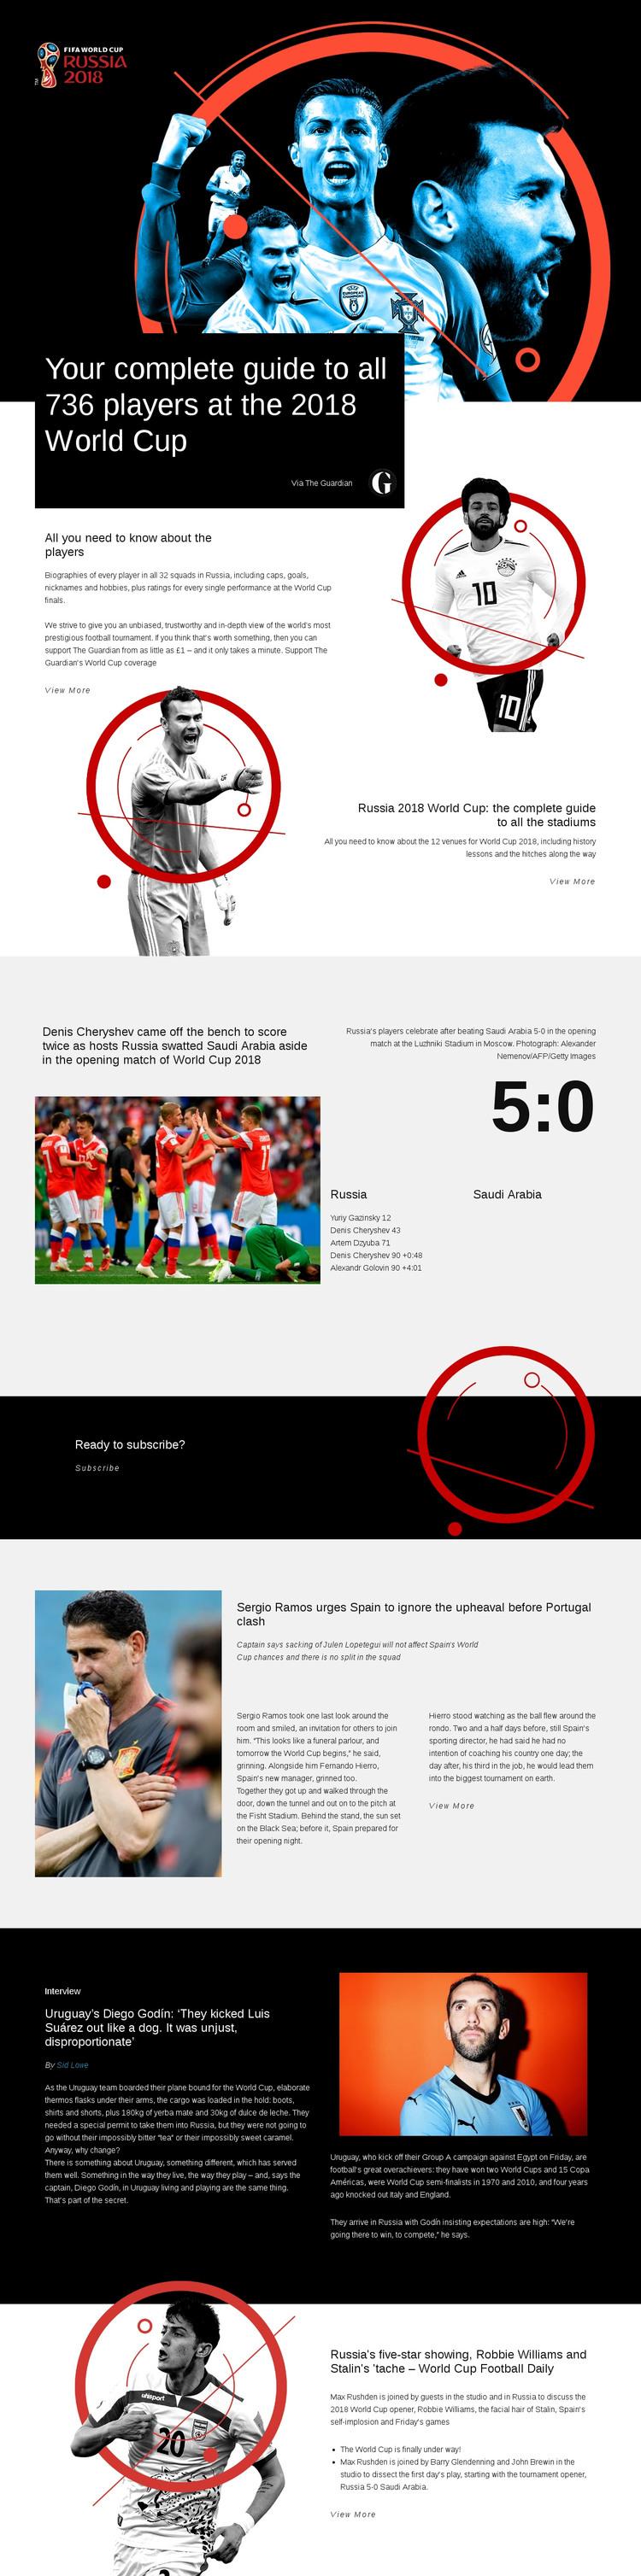 World Cup 2018 Web Design